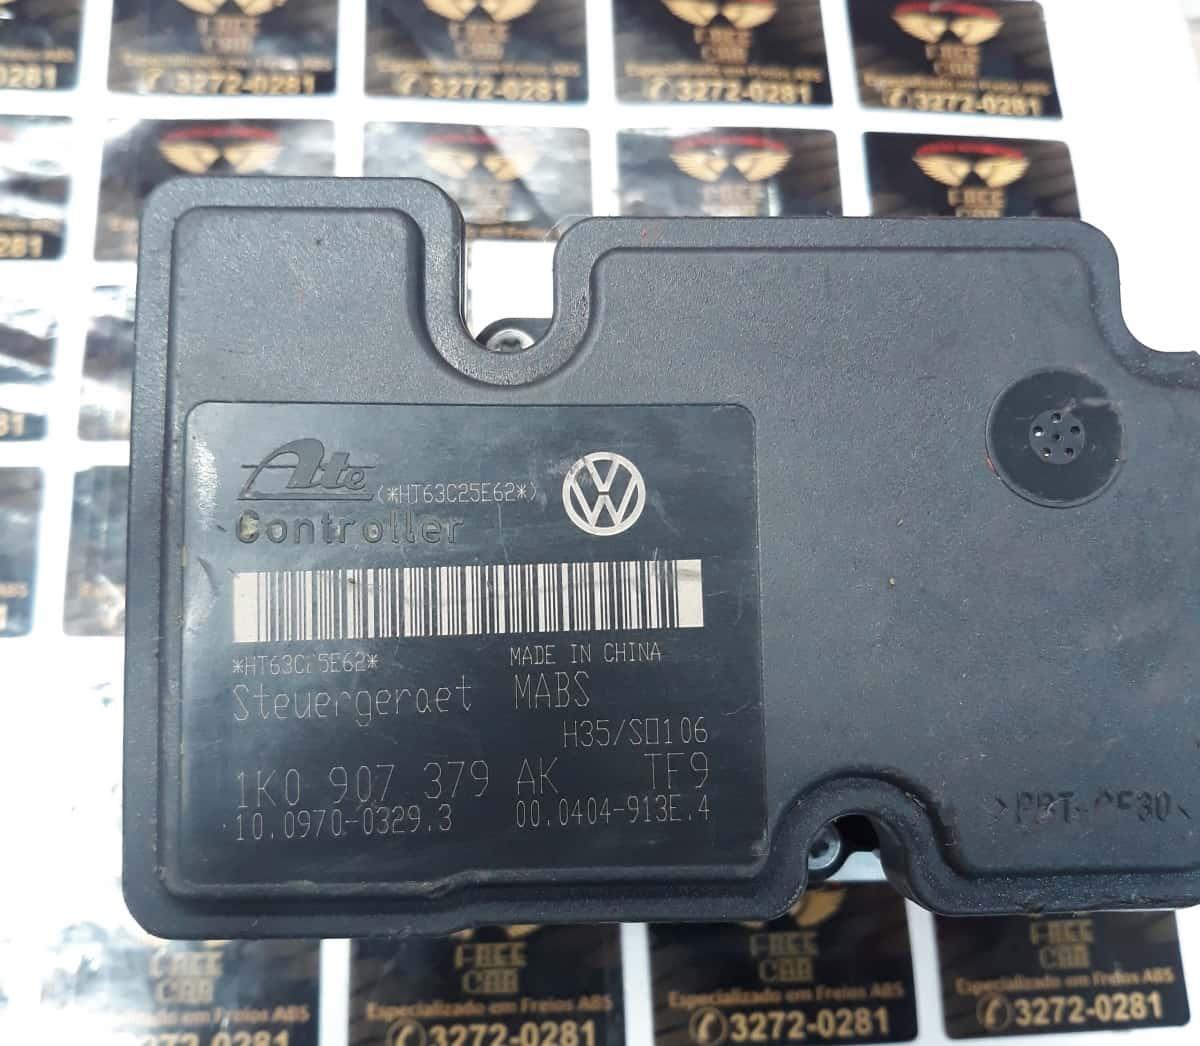 Modulo ABS Volkswagen 1K0 907 379AK /1K0 614 117AG - Foto 1